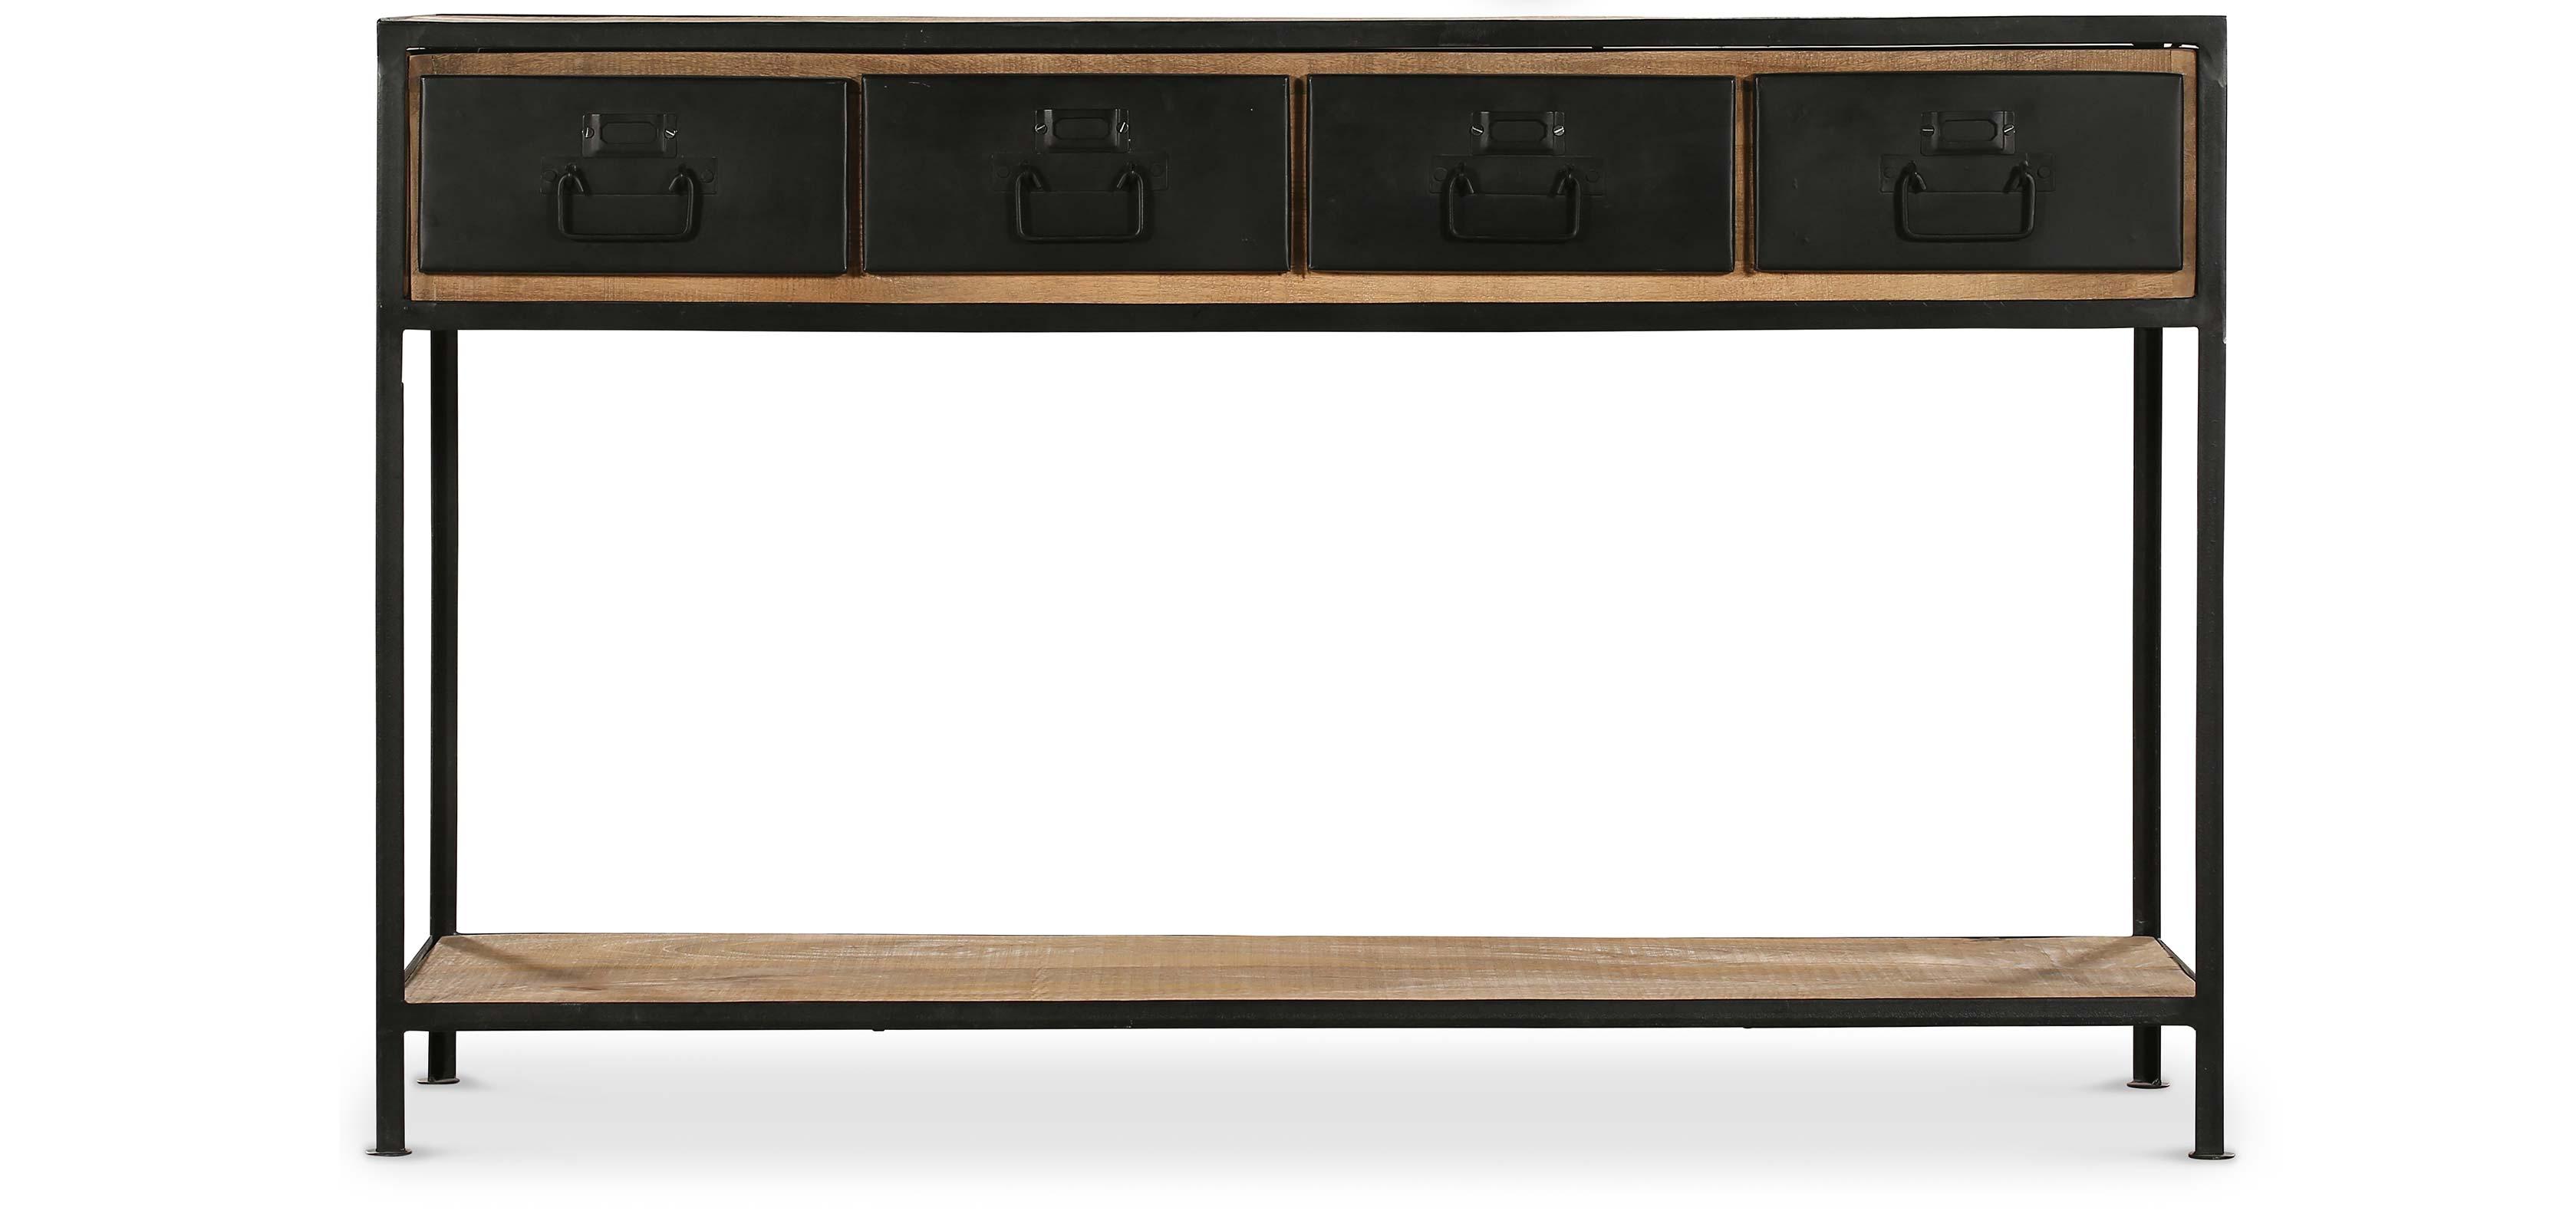 vintage industrial konsolentisch mit schubladen holz. Black Bedroom Furniture Sets. Home Design Ideas